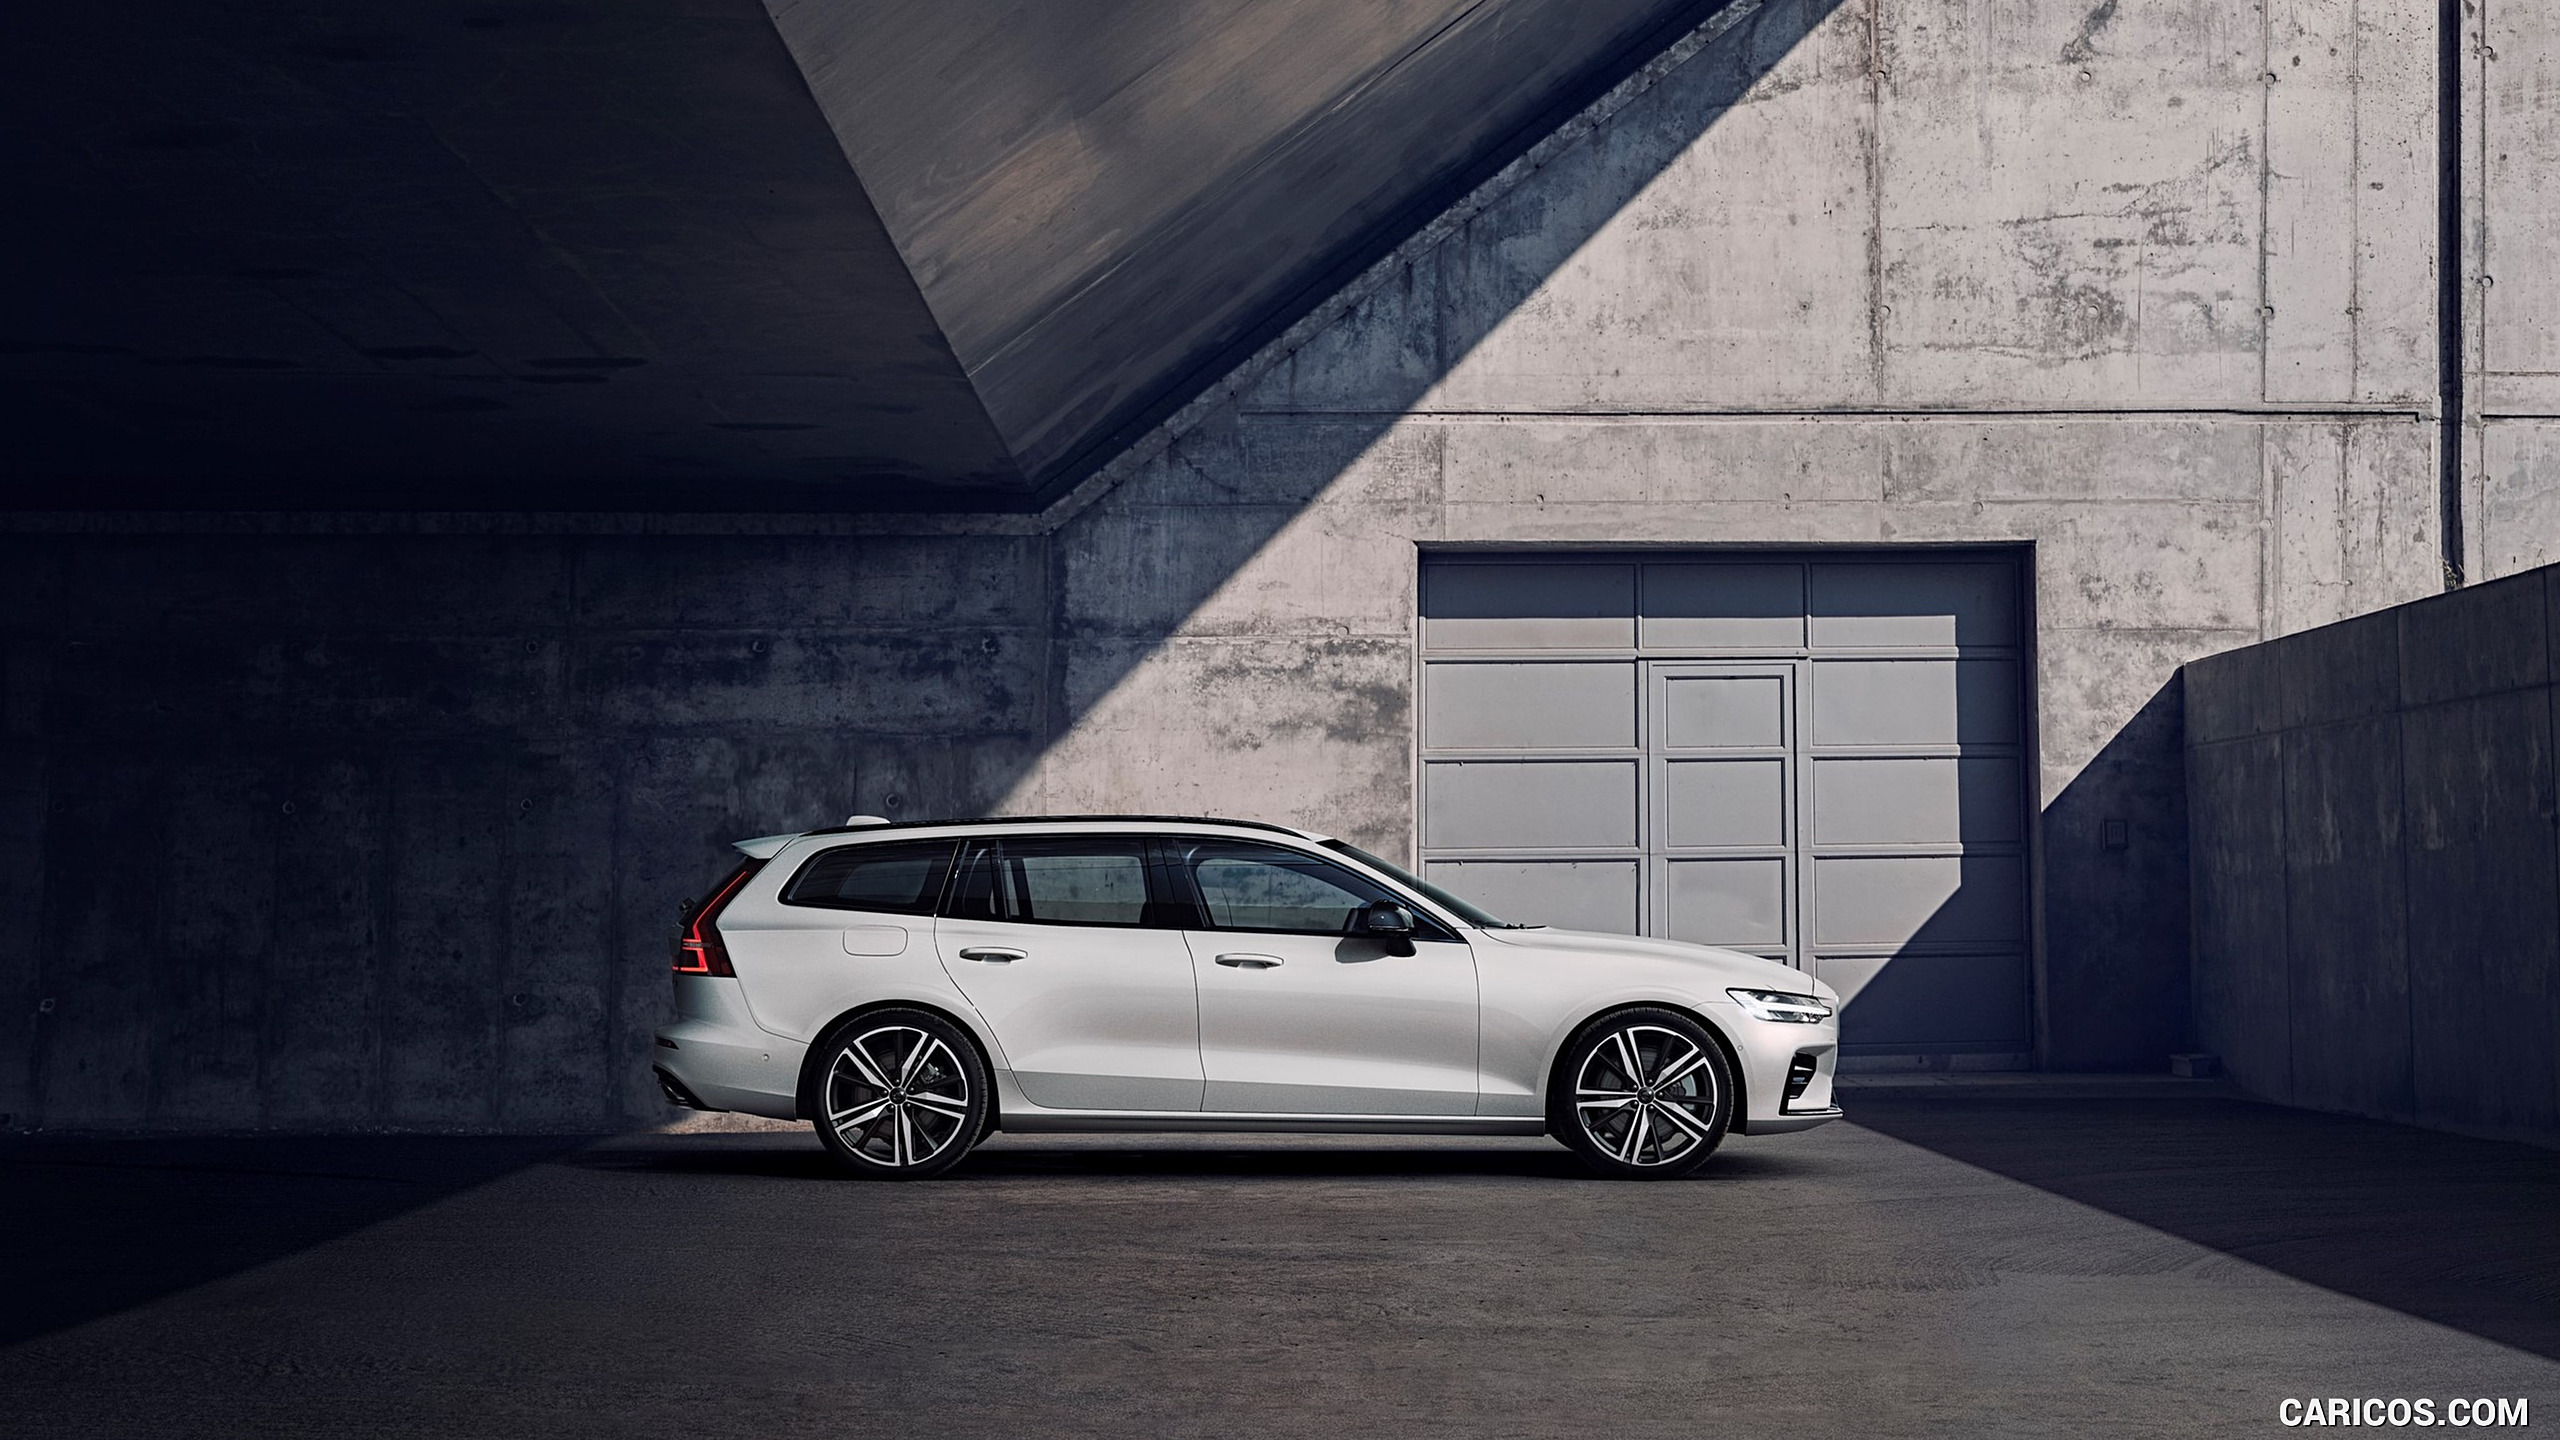 2019 Volvo V60 R Design   Side HD Wallpaper 246 2560x1440